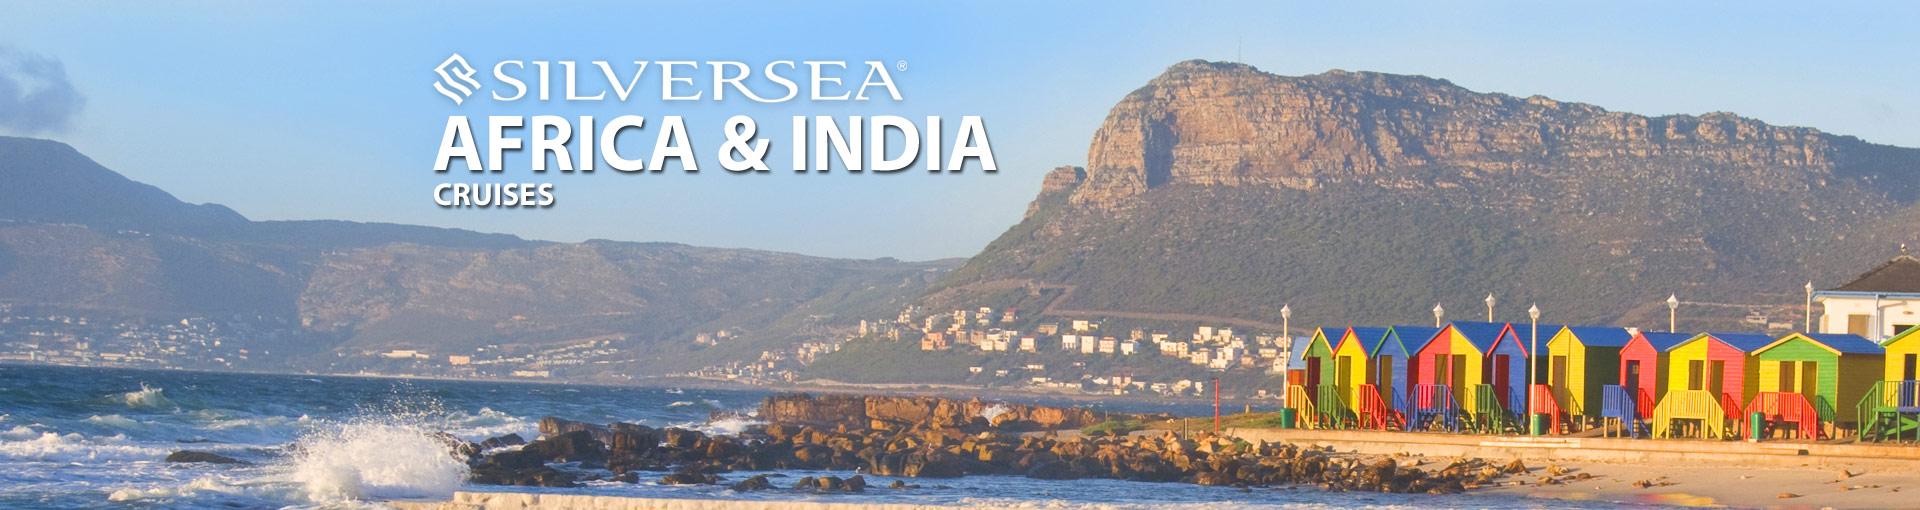 Silversea Cruises Africa Cruises